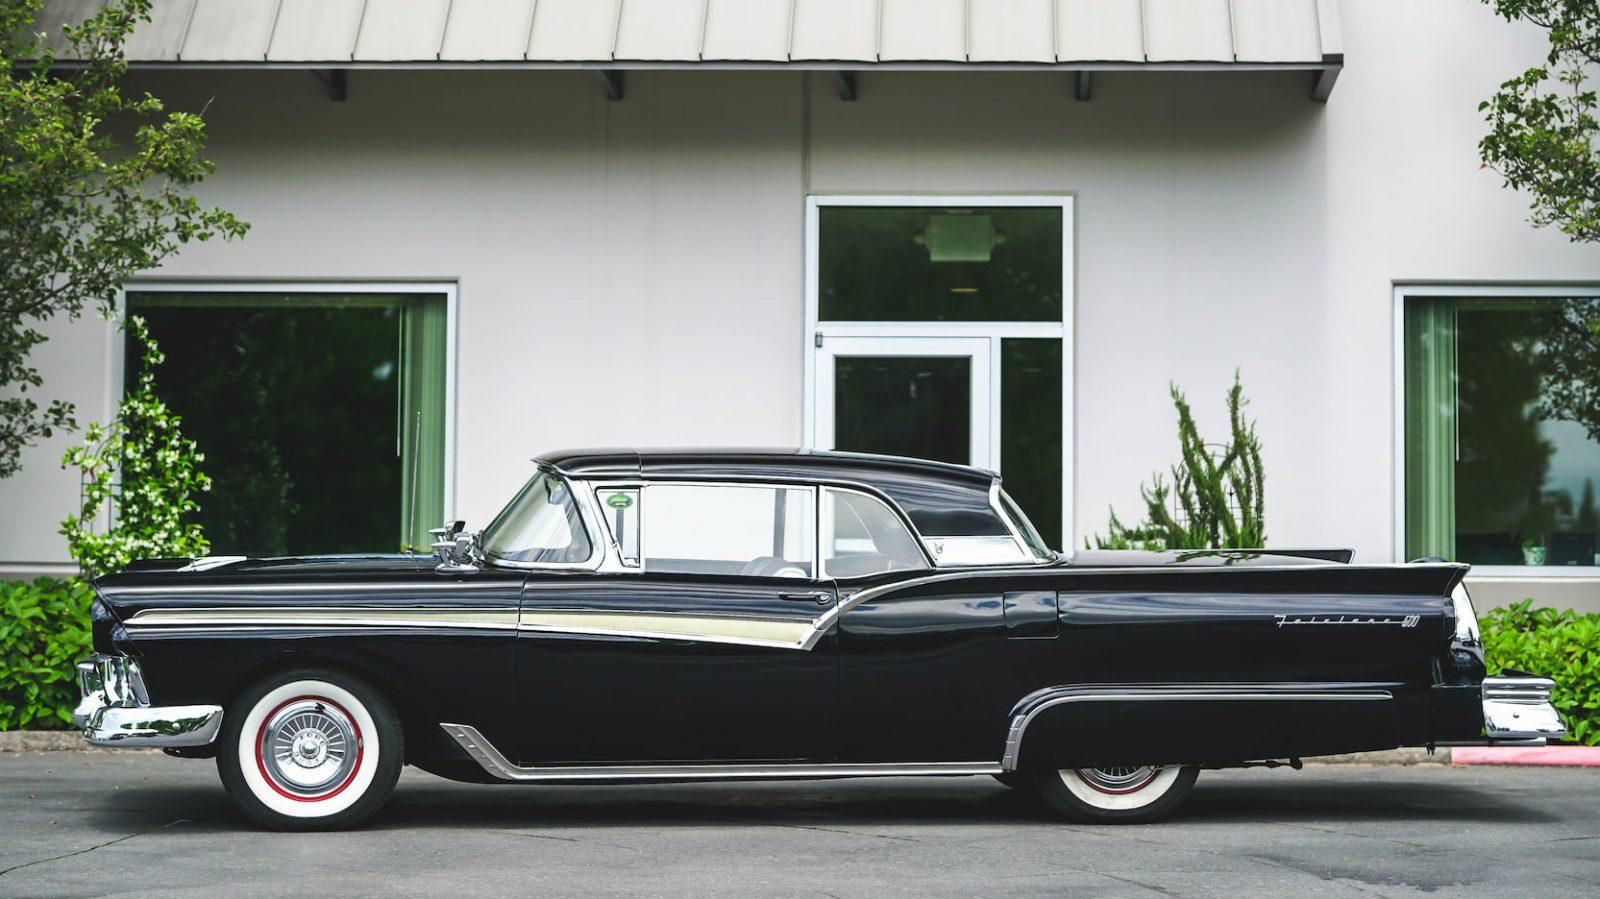 Фотографии автомобиля FORD FAIRLANE 500 1957 года.